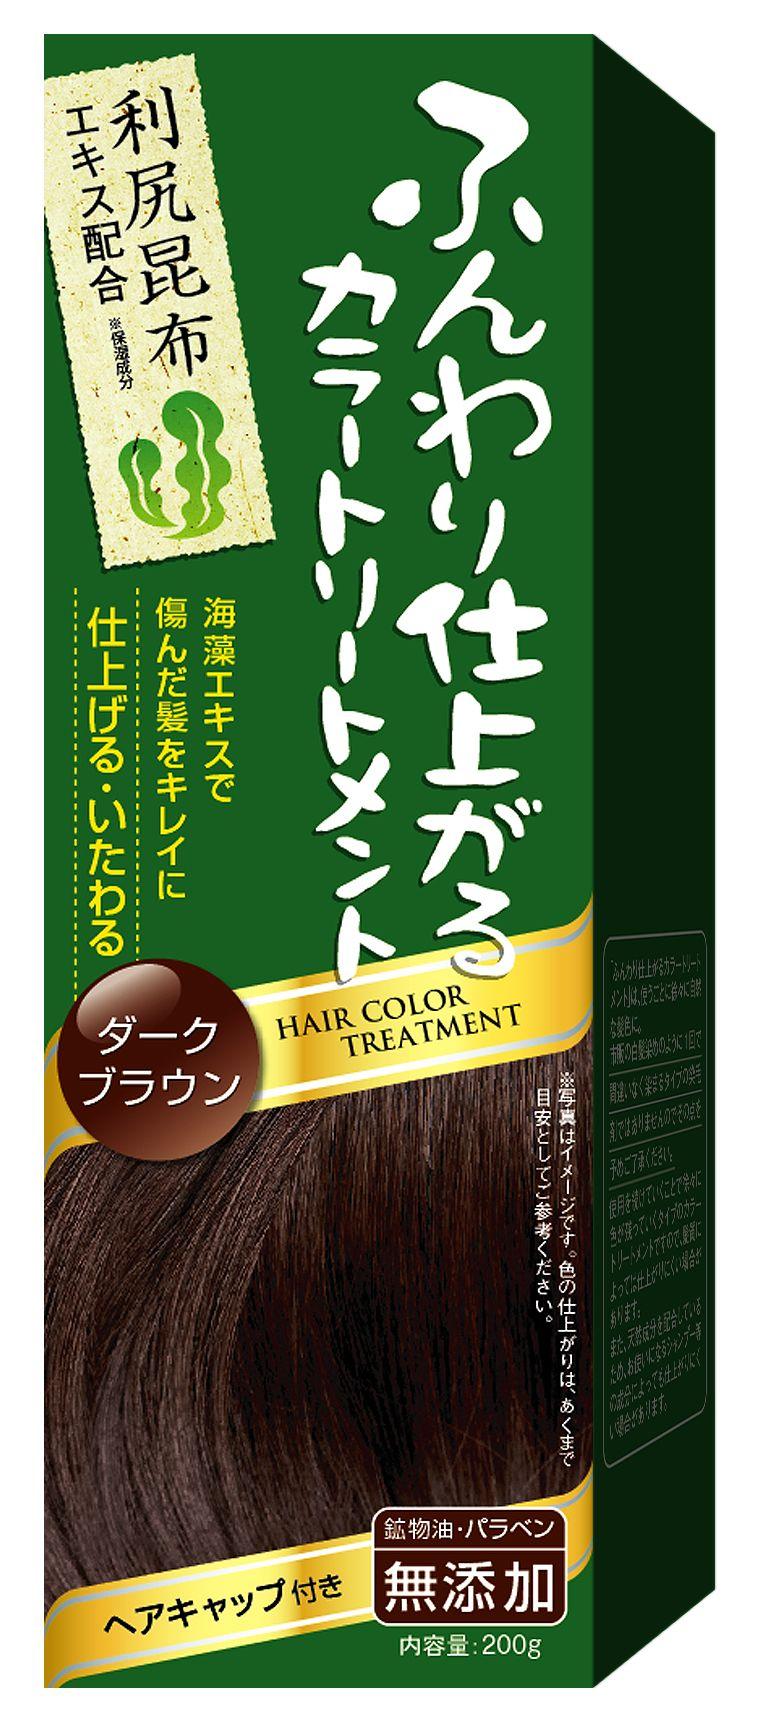 Rishiri hair color treatment 利尻昆布